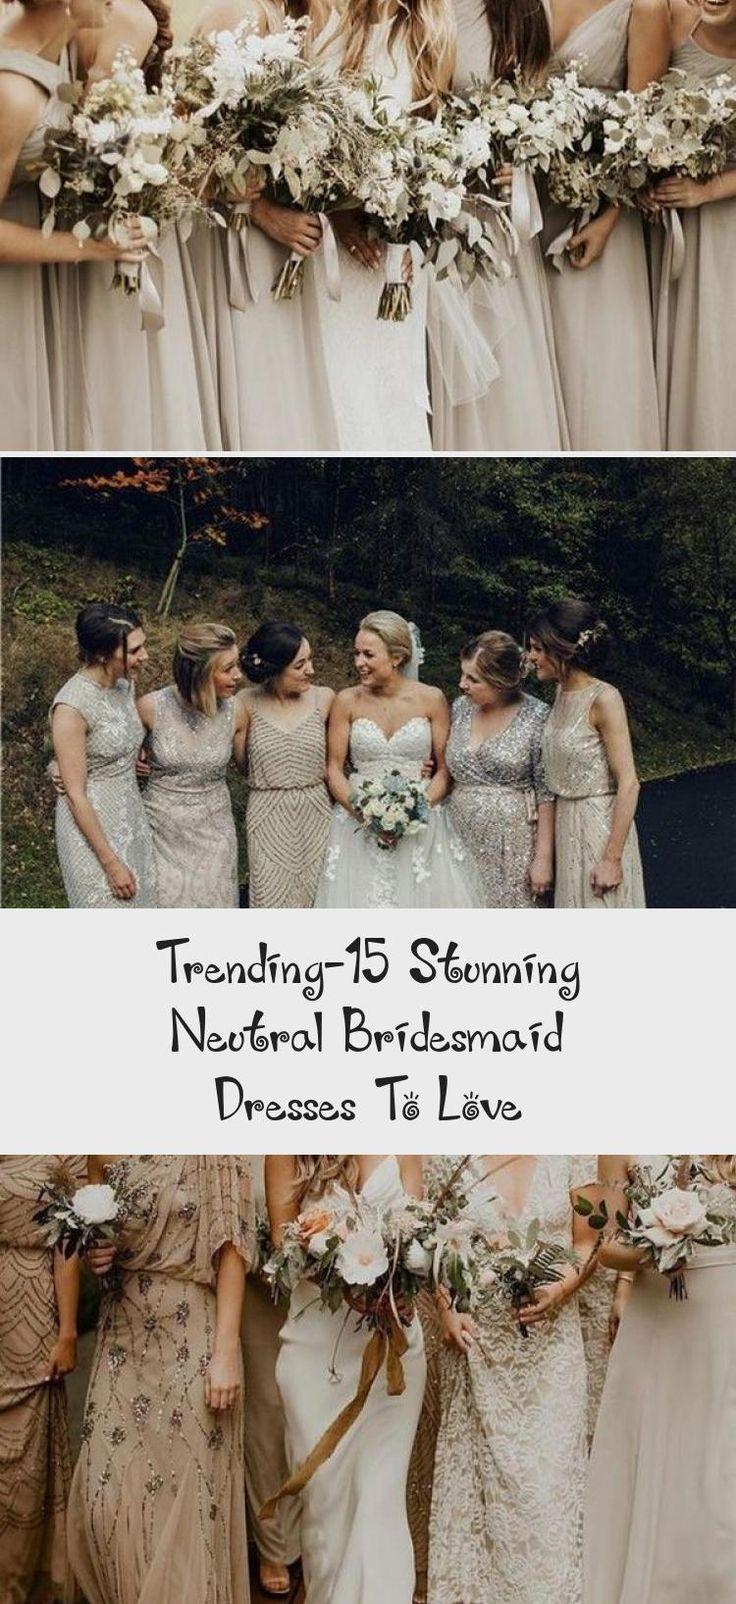 neutral champagne bridesmaid dresses #obde #weddingideas2019 #BridesmaidDressesSequin #BurgundyBridesmaidDresses #BridesmaidDressesColors #PinkBridesmaidDresses #TanBridesmaidDresses